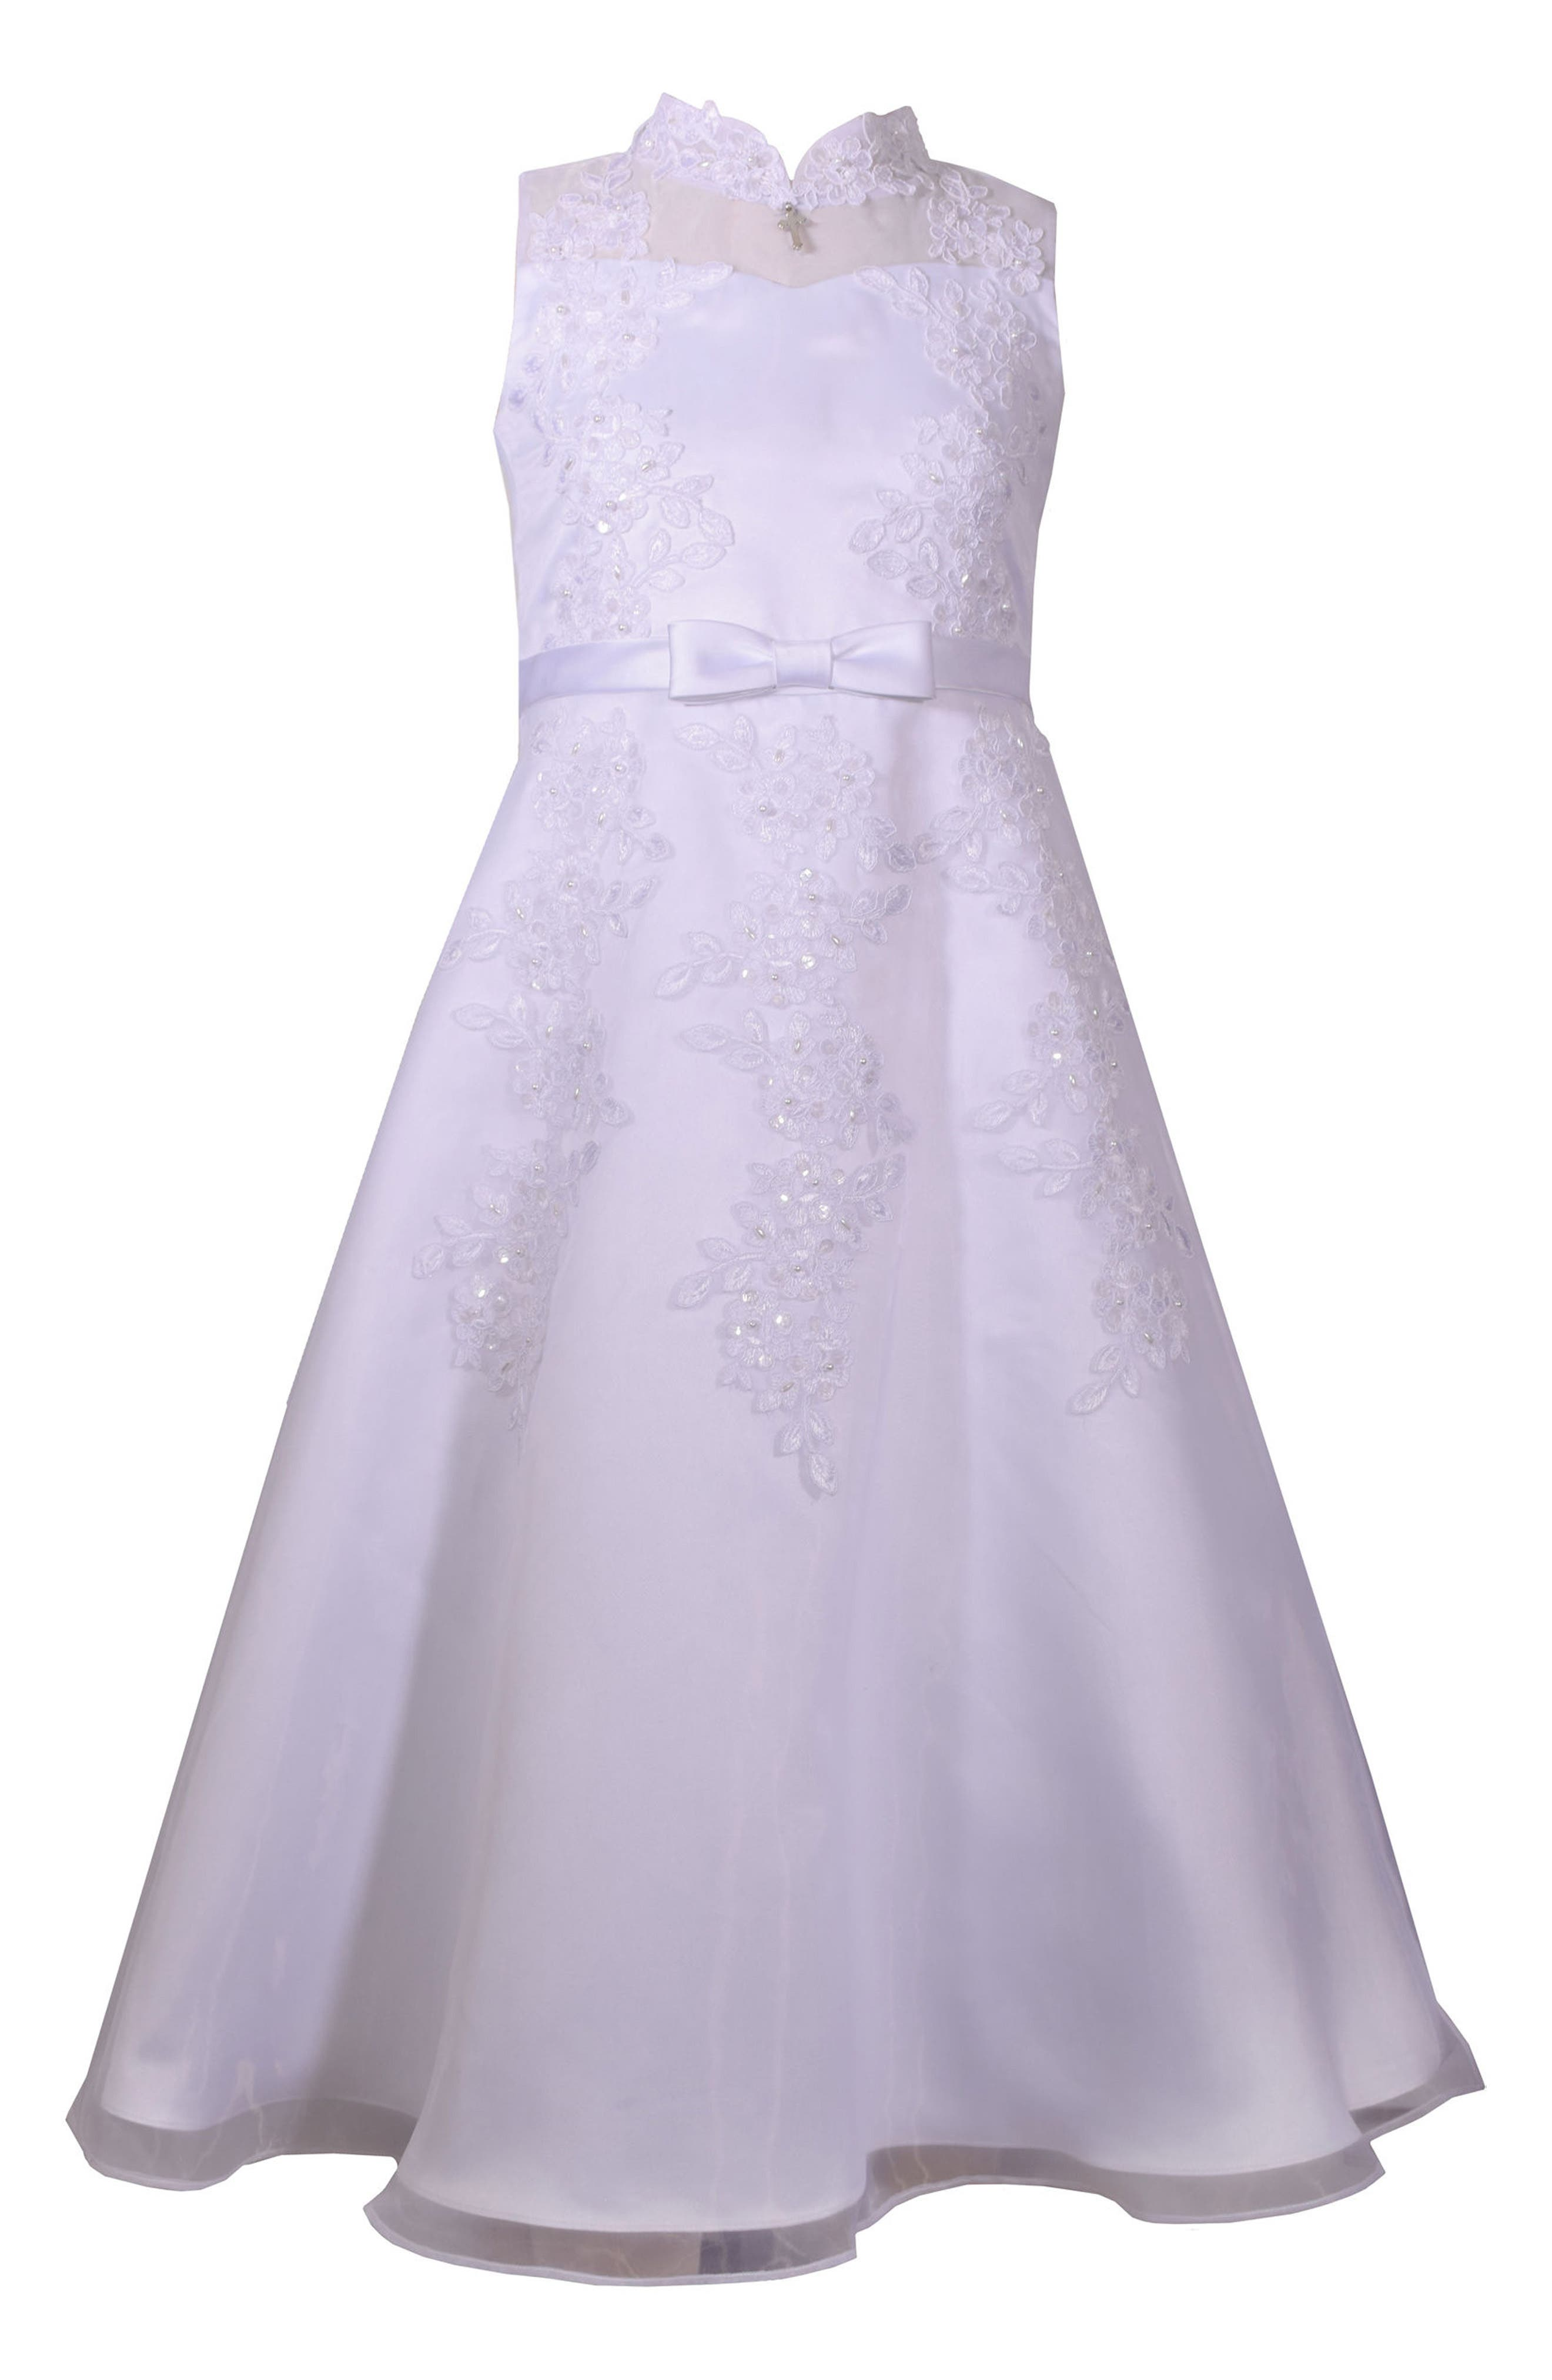 Sequin First Communion Dress,                             Main thumbnail 1, color,                             100